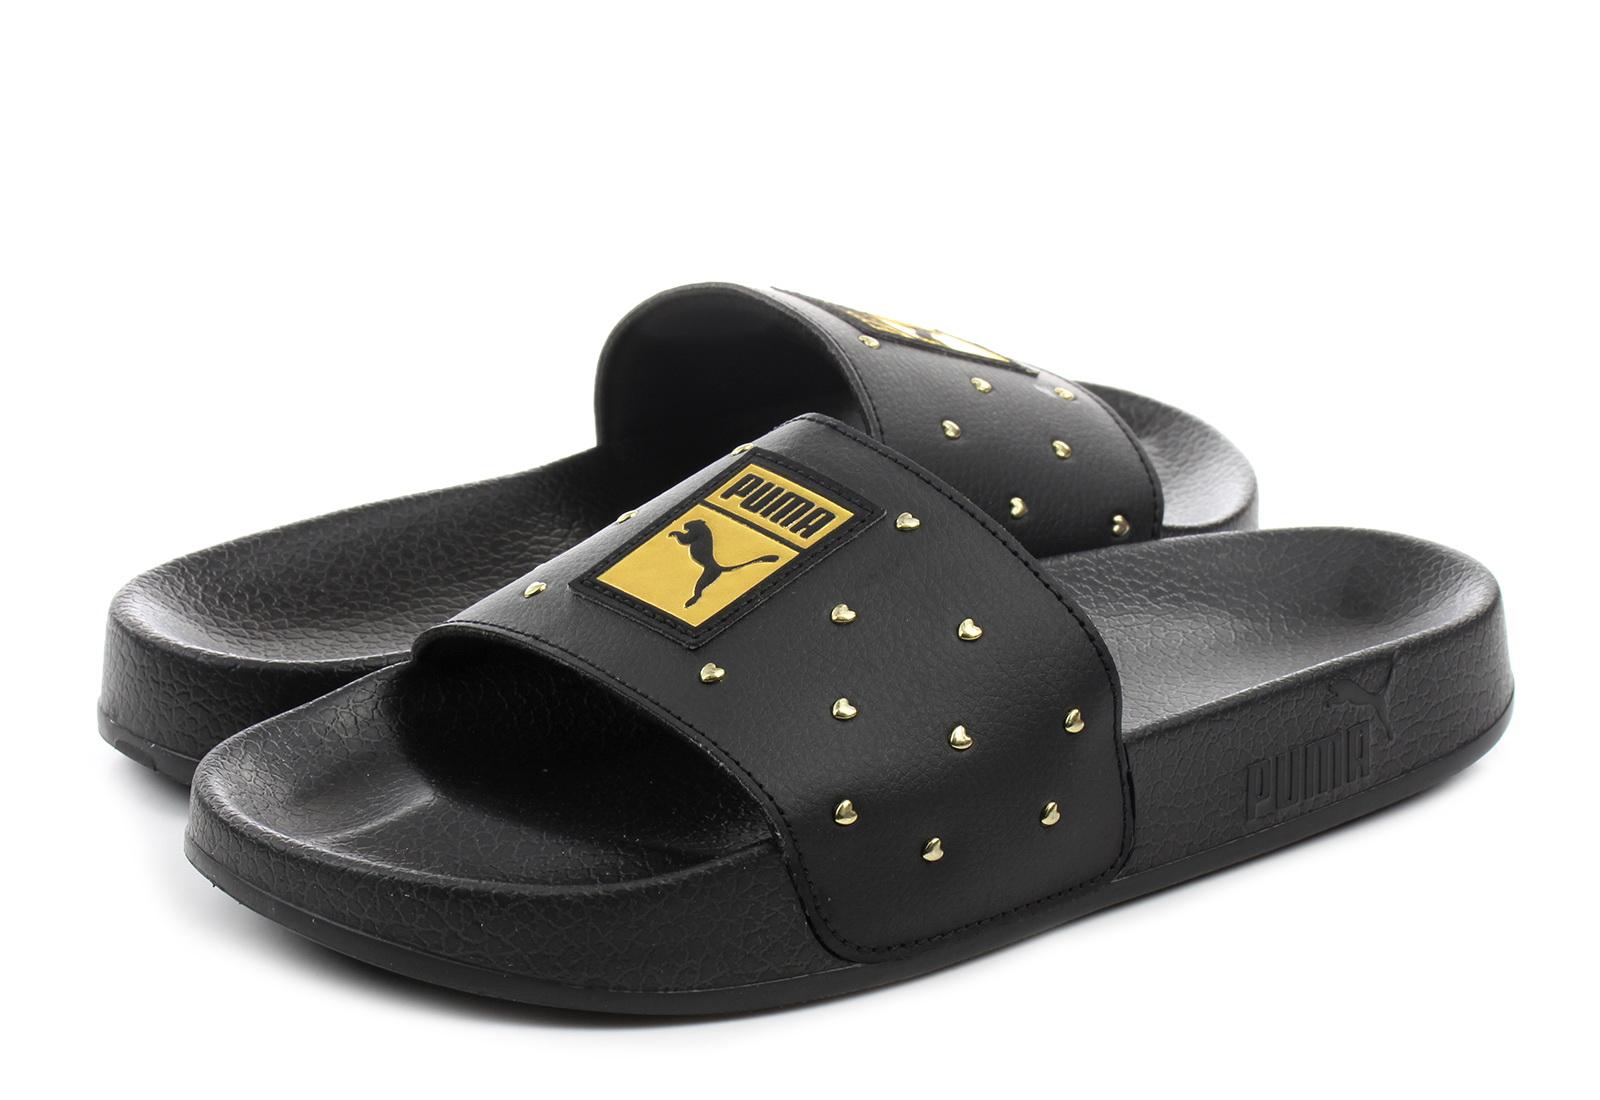 f8fdbfdfa0 Puma Papucs - Leadcat Studs Wns - 36940501-blk - Office Shoes ...